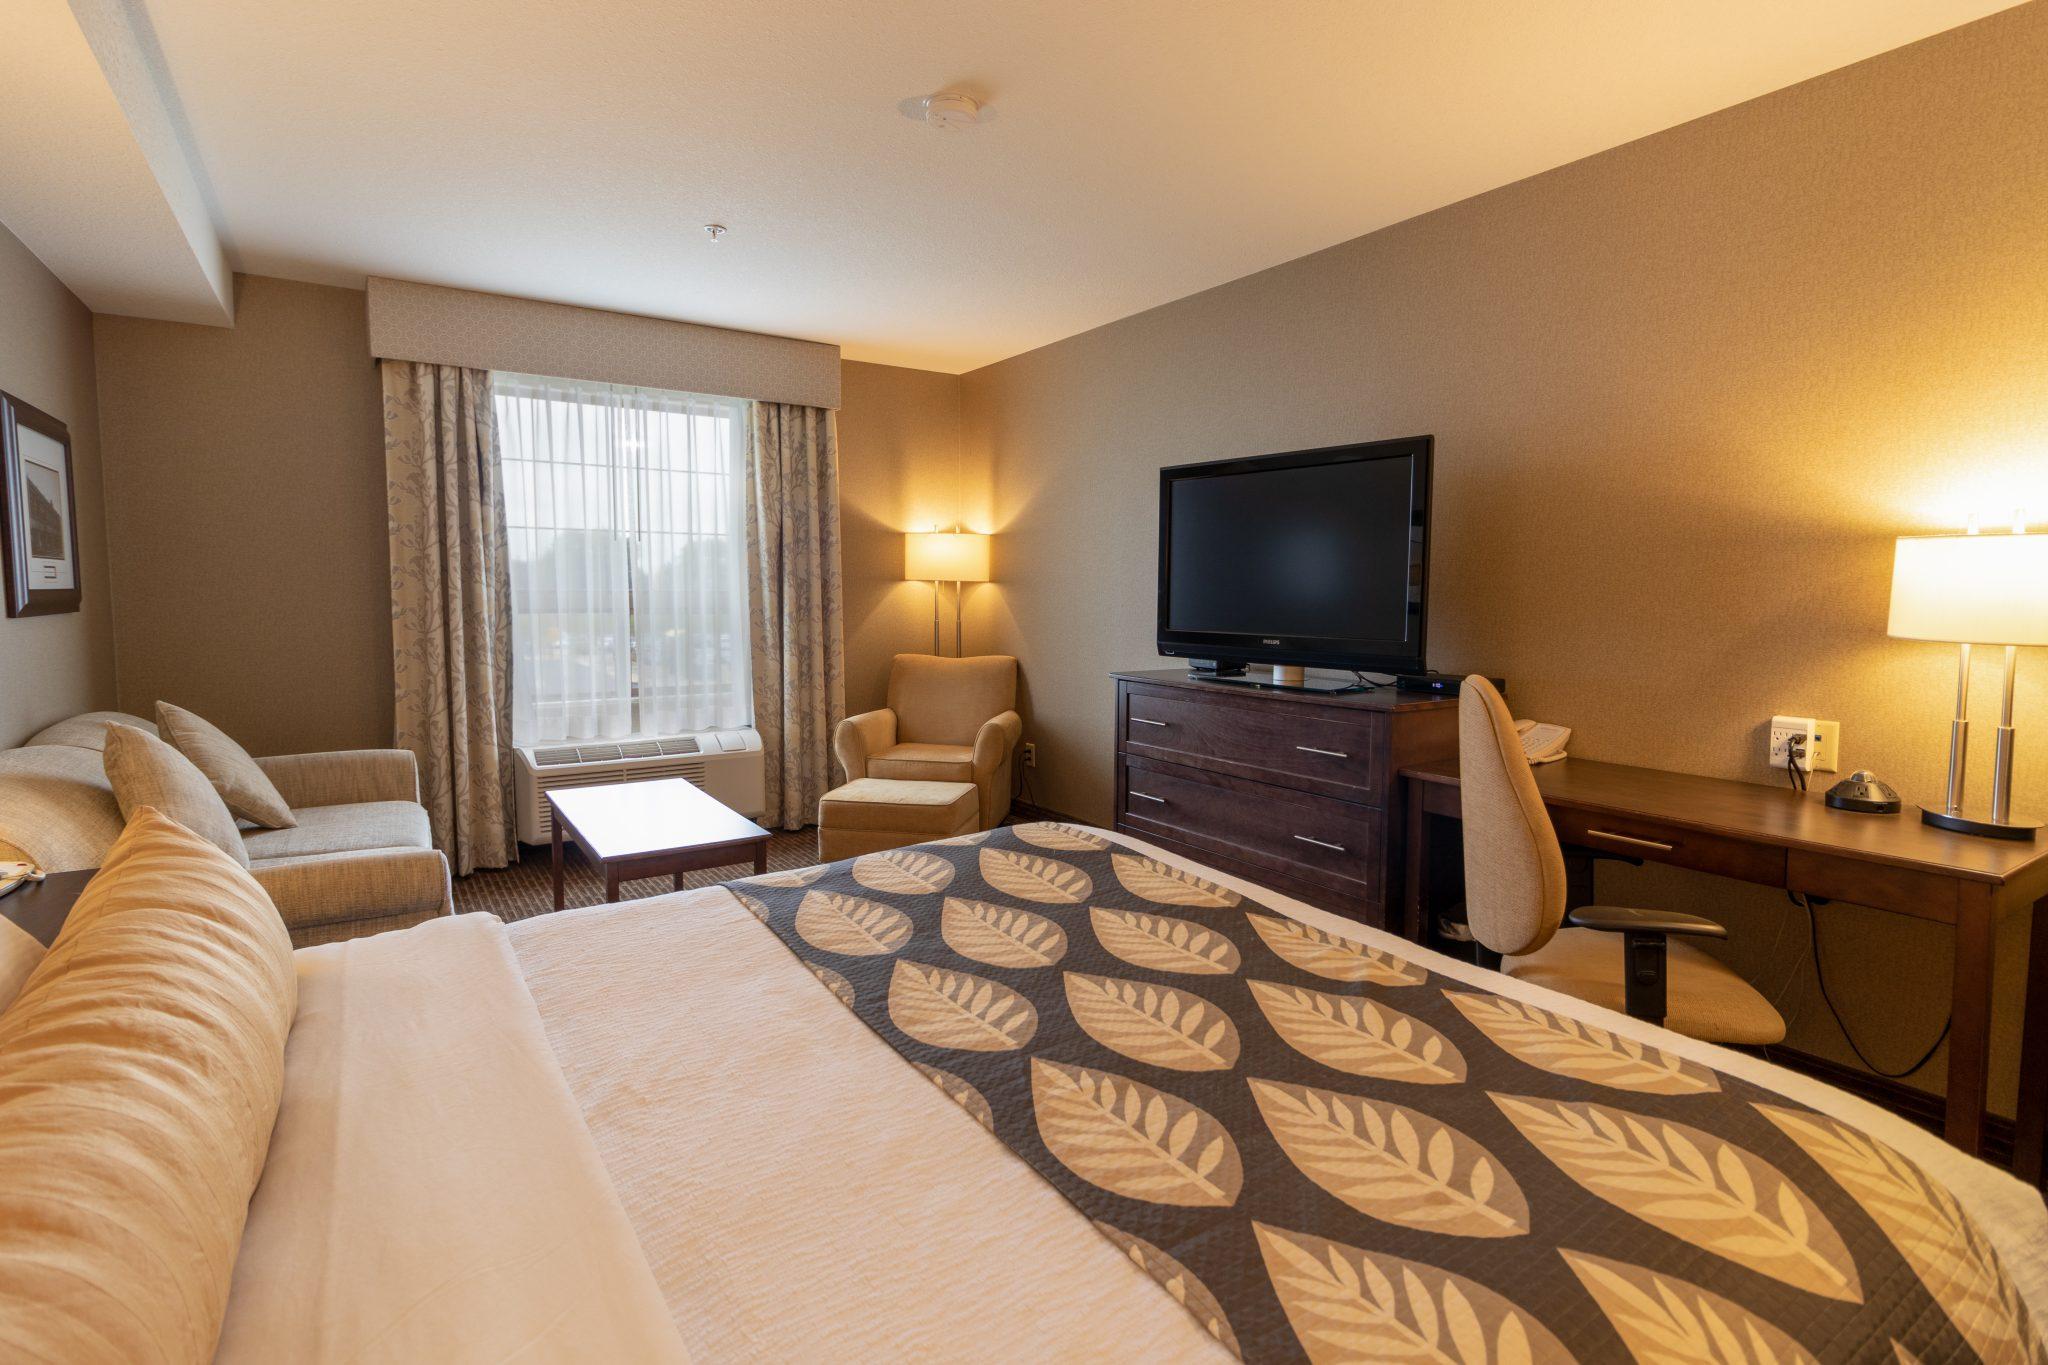 hotel in fort saskatchewna Kanata Inns Deluxe Business King Fort Saskatchewan